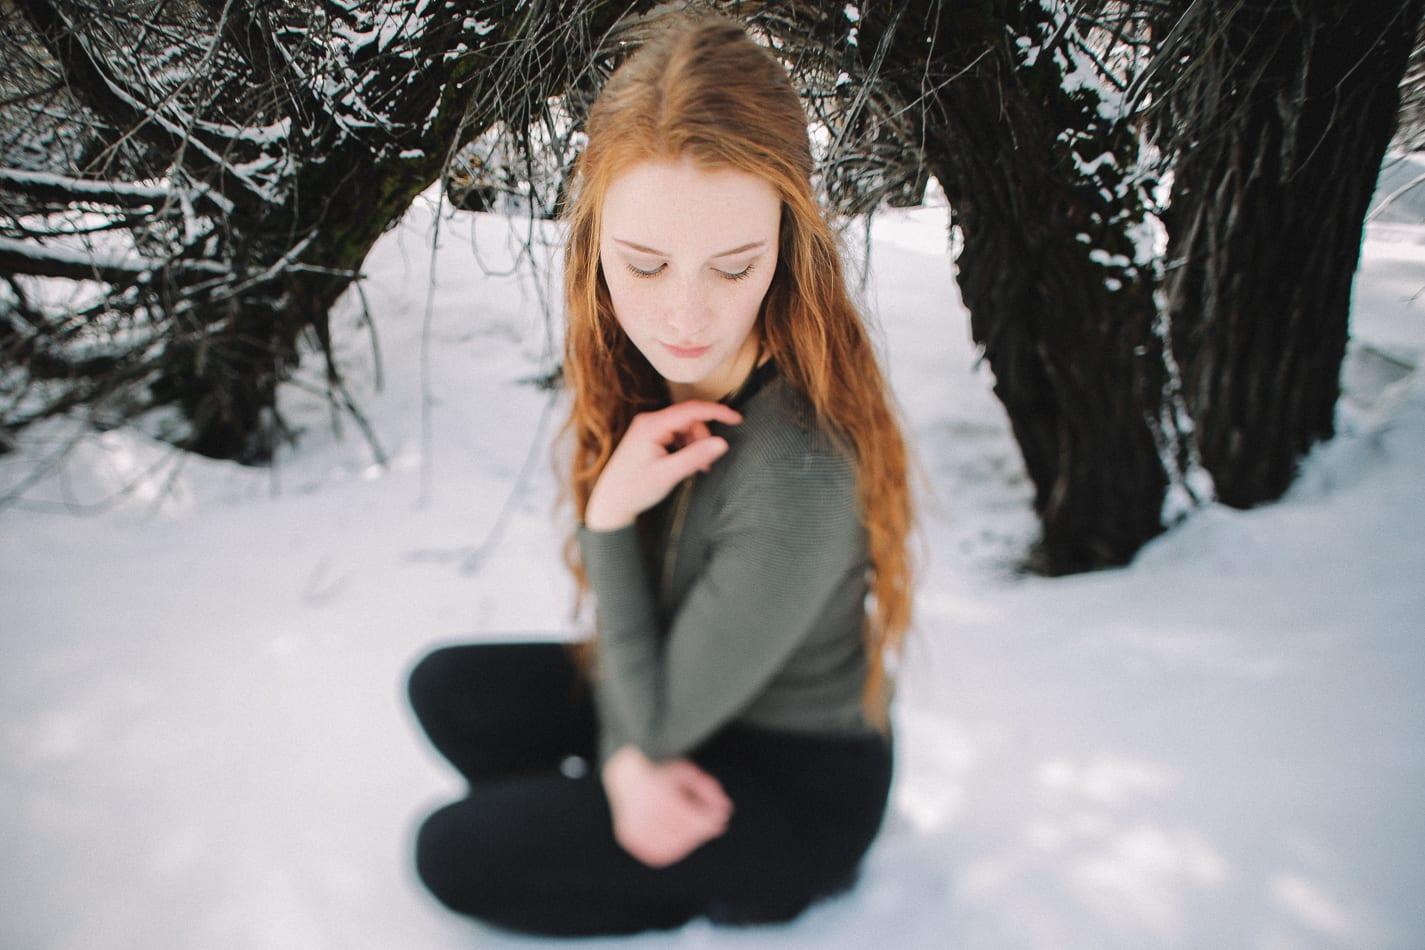 mount-lassen-winter-portrait-photo-5